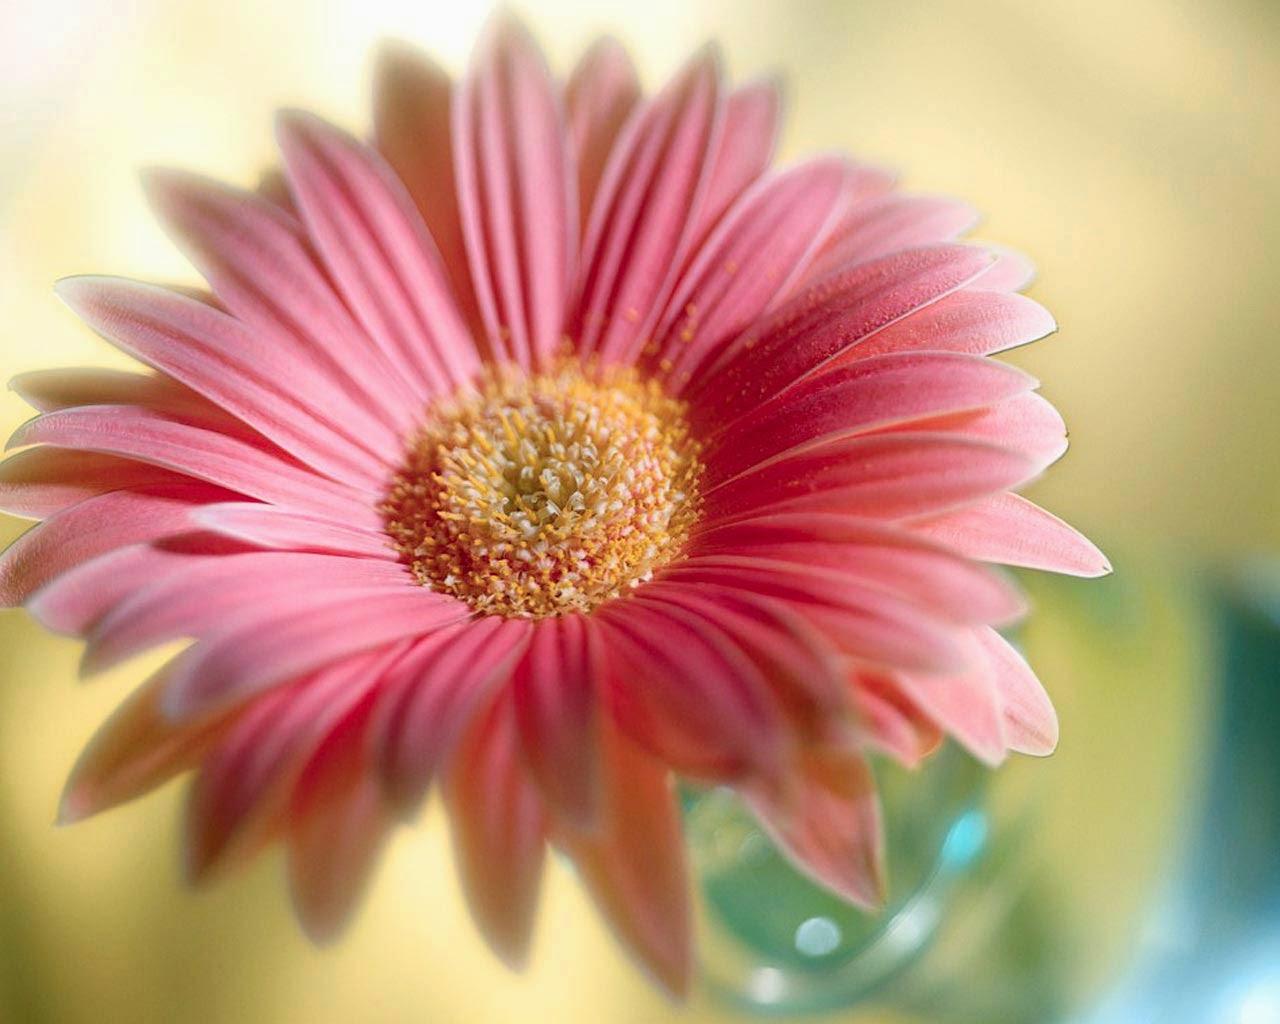 Pink flower wallpapers background hd desktop wallpapers free download mightylinksfo